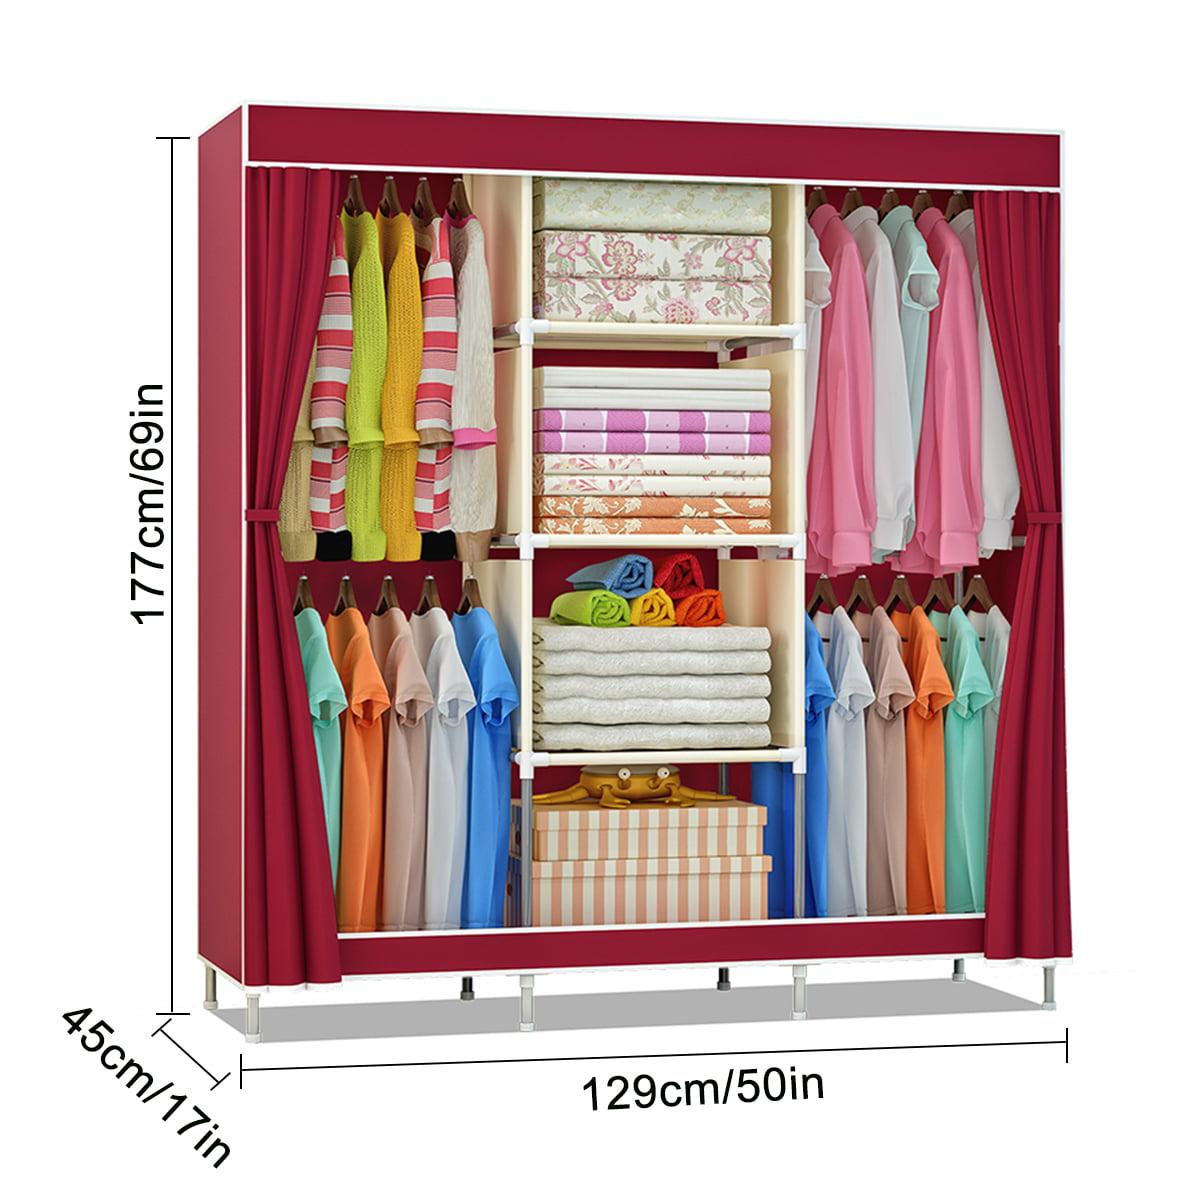 Closet Hanging Shelves Wardrobe Storage Shelves Clothes Hanging Shelves